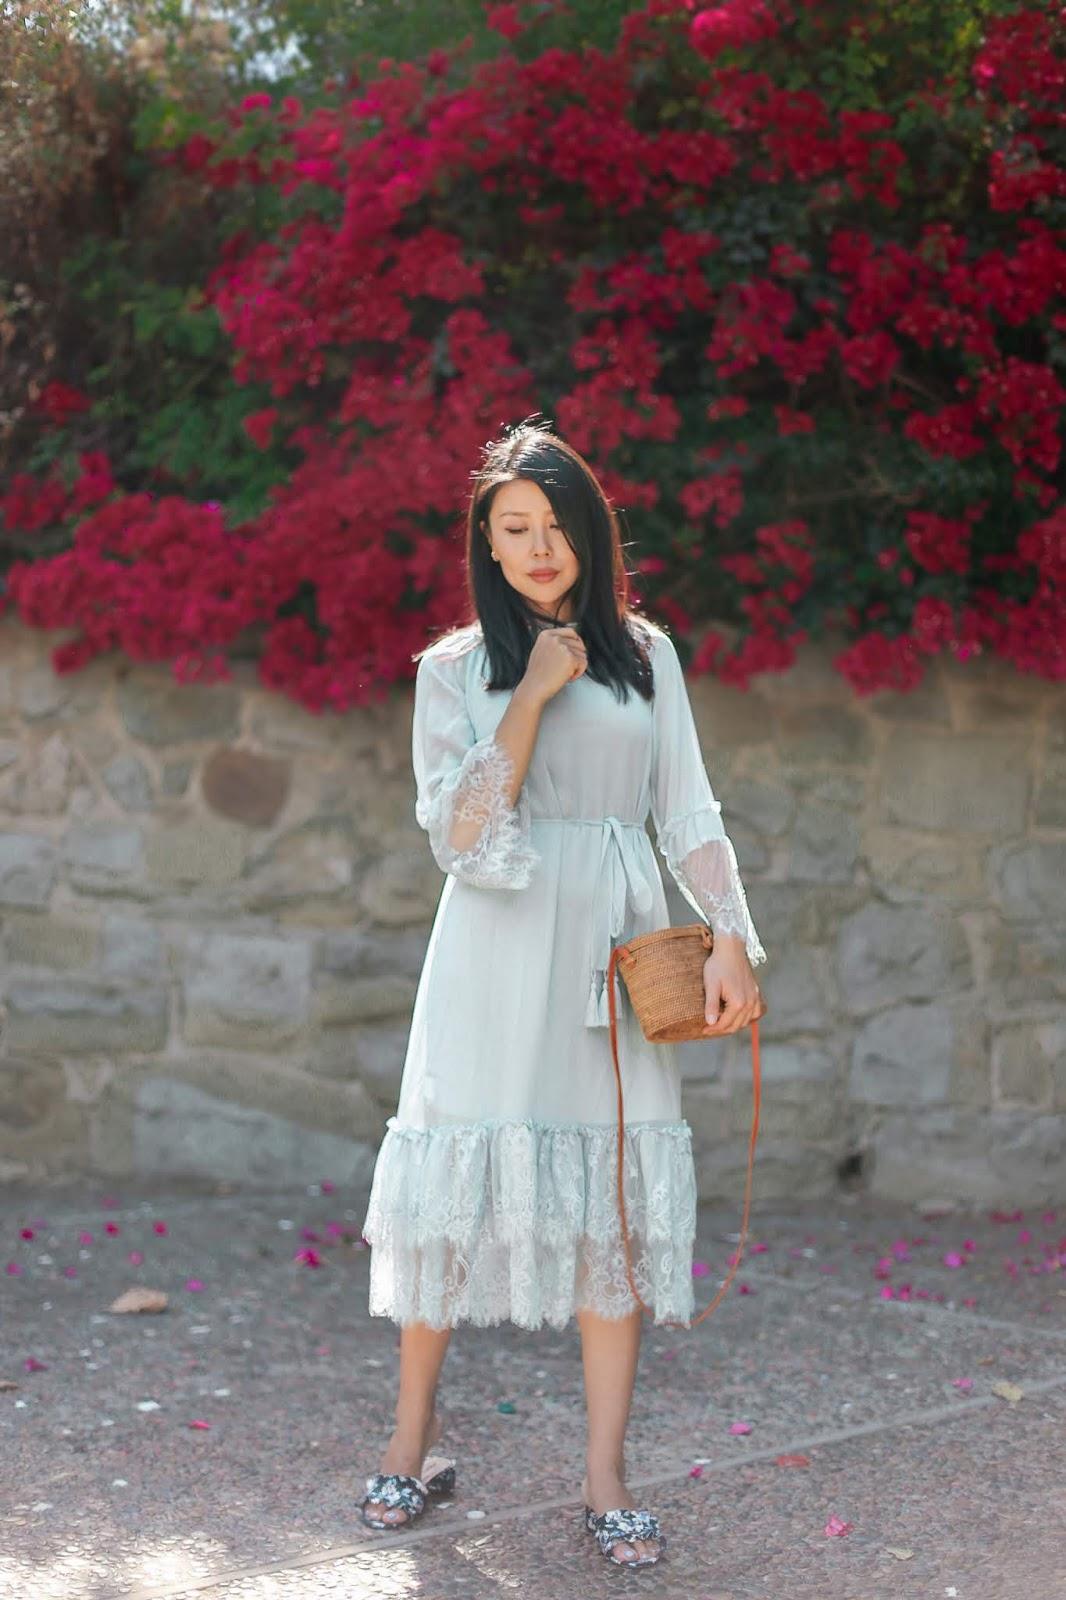 summer wedding guest outfit ideas